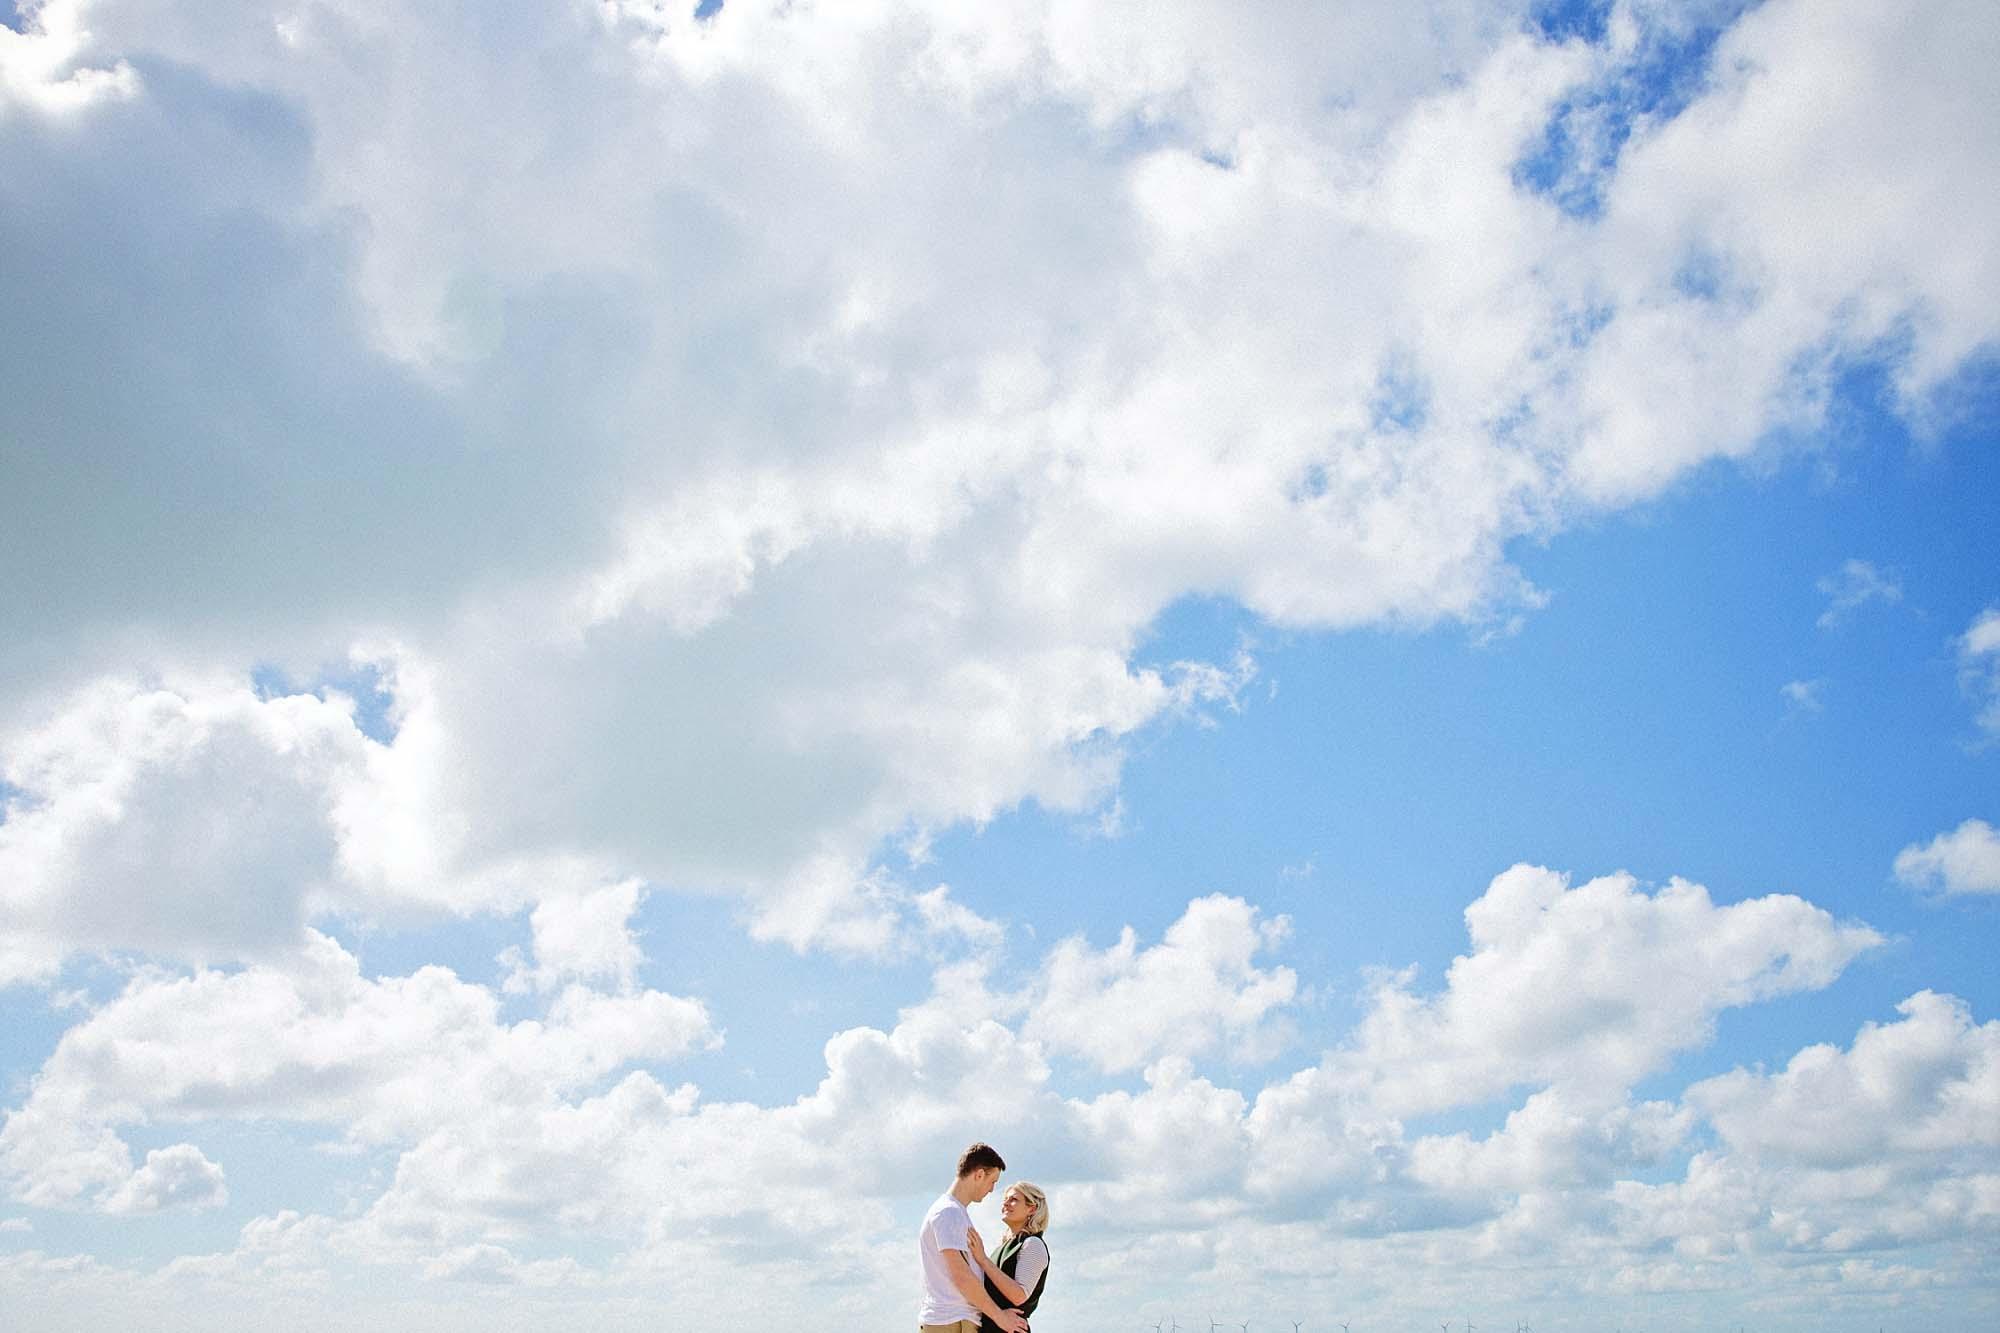 Mersea-Island-Beach-Engagement_0018.jpg